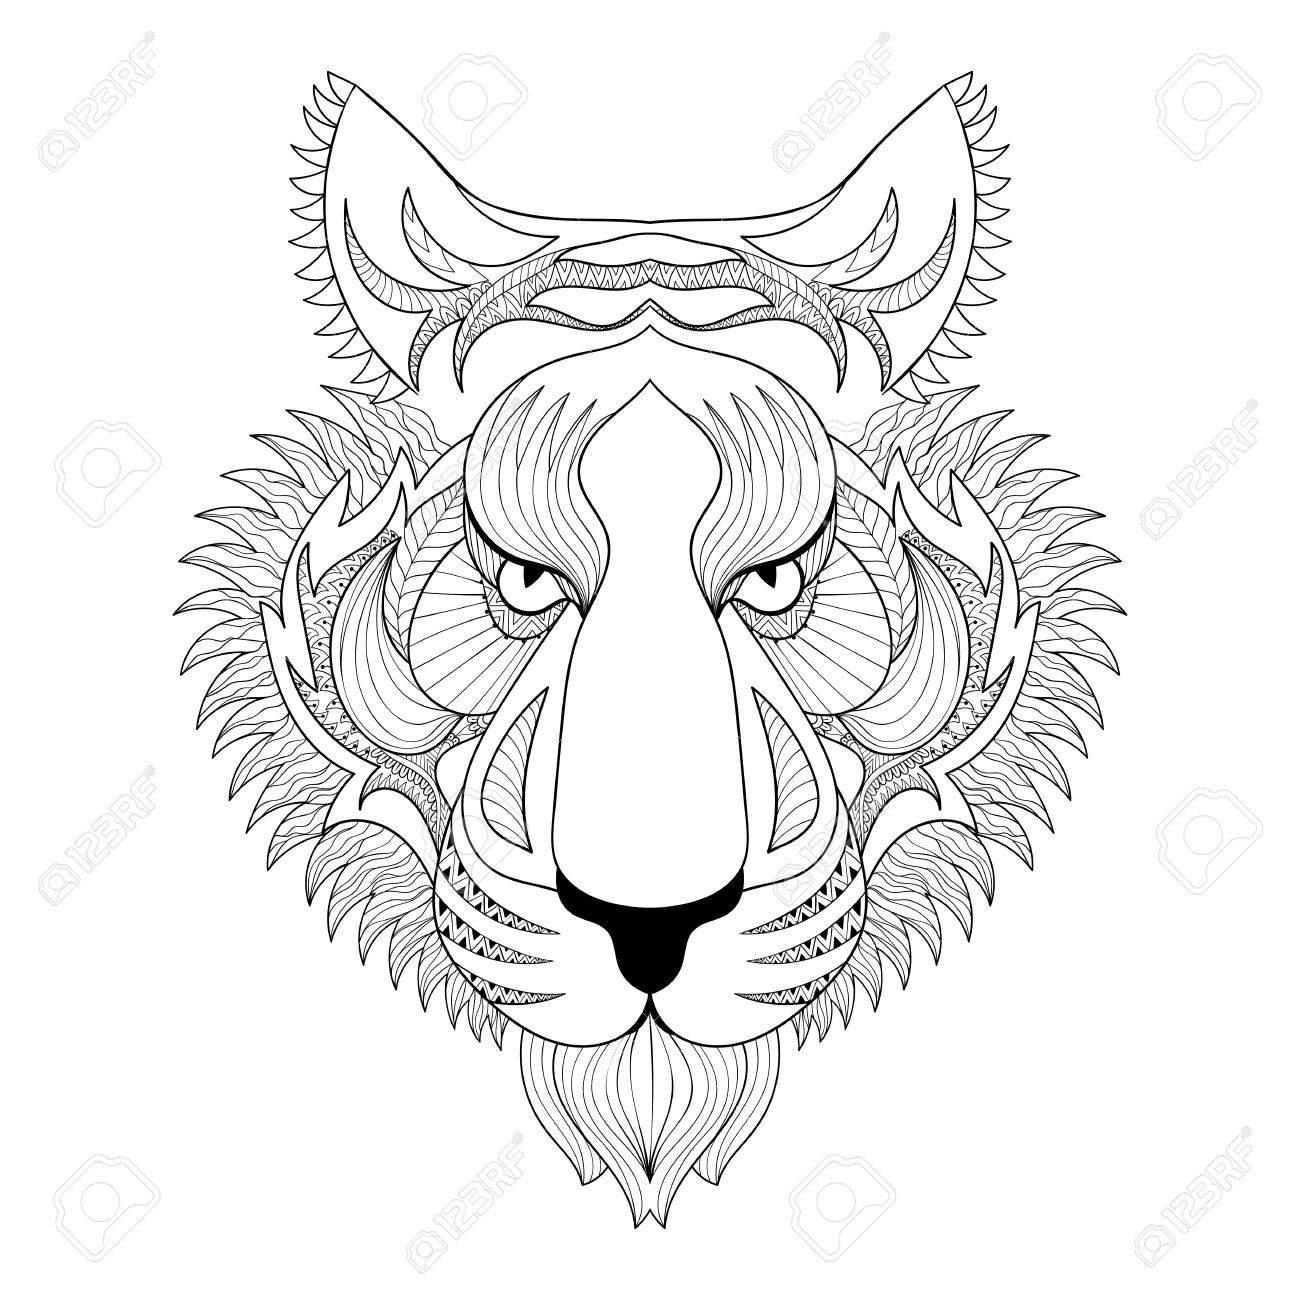 Coloriage Anti Stress Visage.Vector Tiger Visage Zentangle Tiger Illustration Tete De Tigre Impression Pour Coloriage Anti Stress Adulte Hand Drawn Artistiquement Ornement A